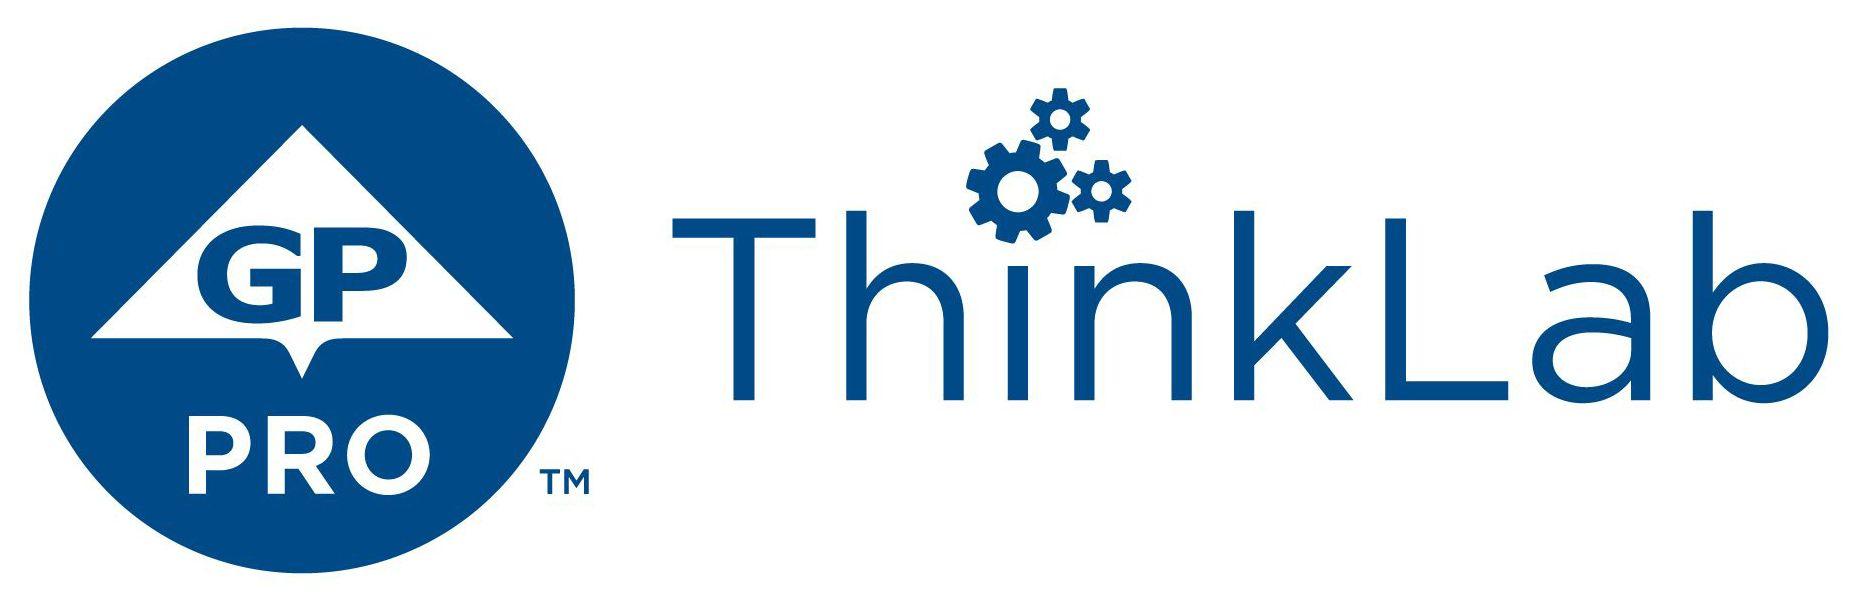 GP Pro ThinkLab